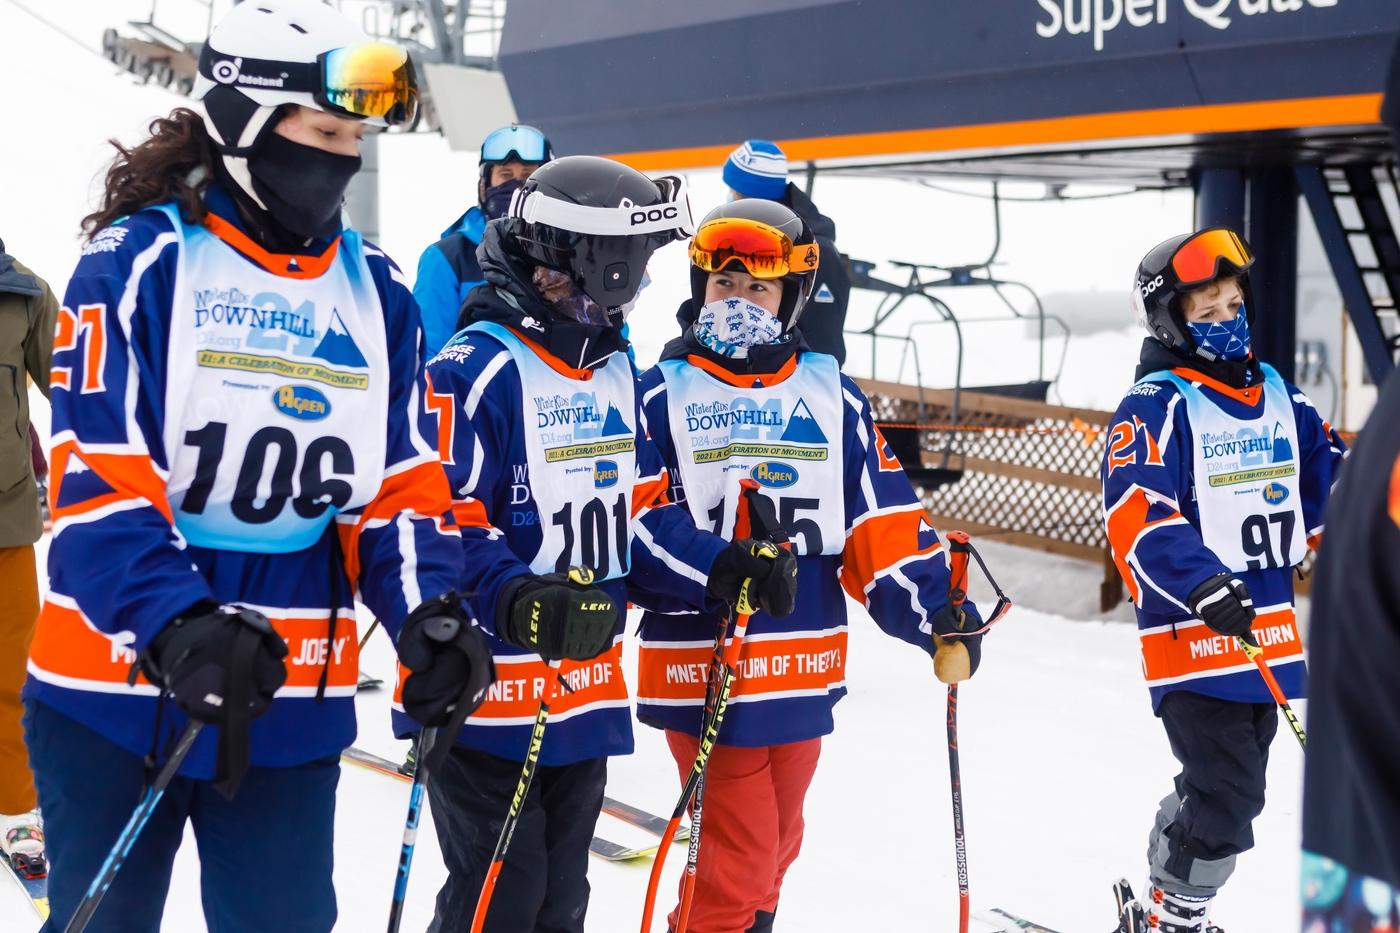 WinterKids Downhill 24 2021 SDP 2694